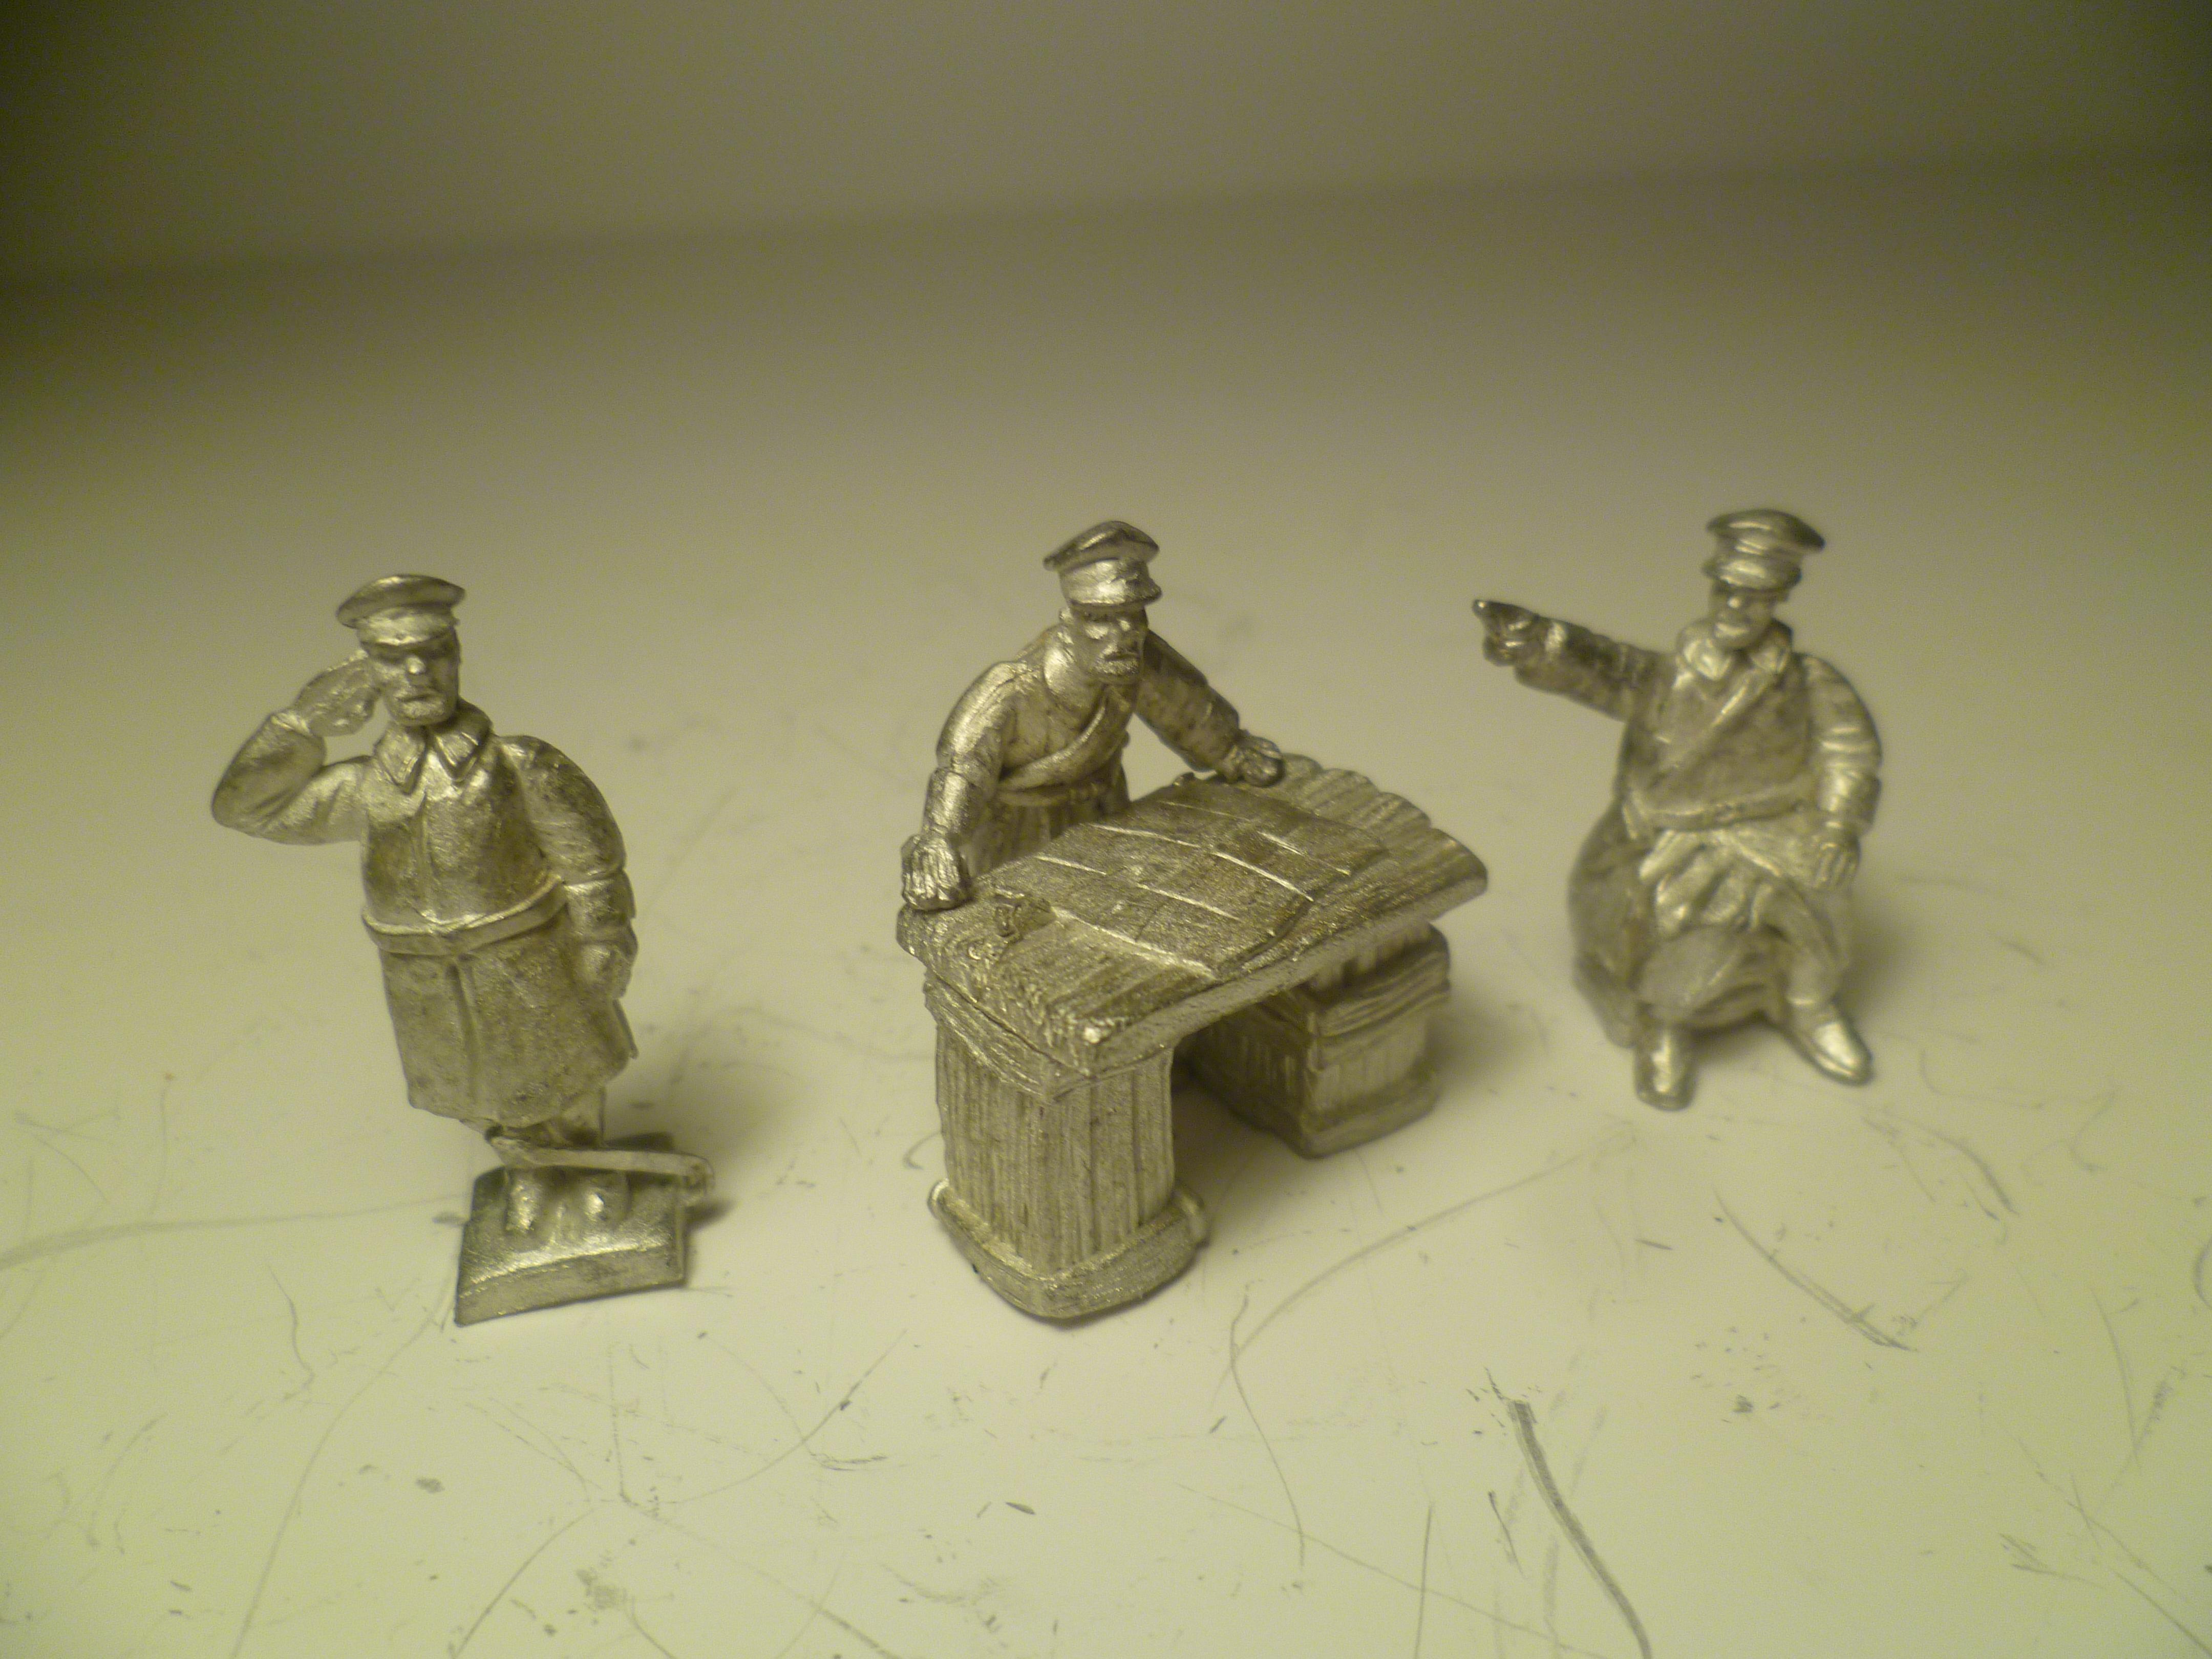 Soviet Officer Diorama